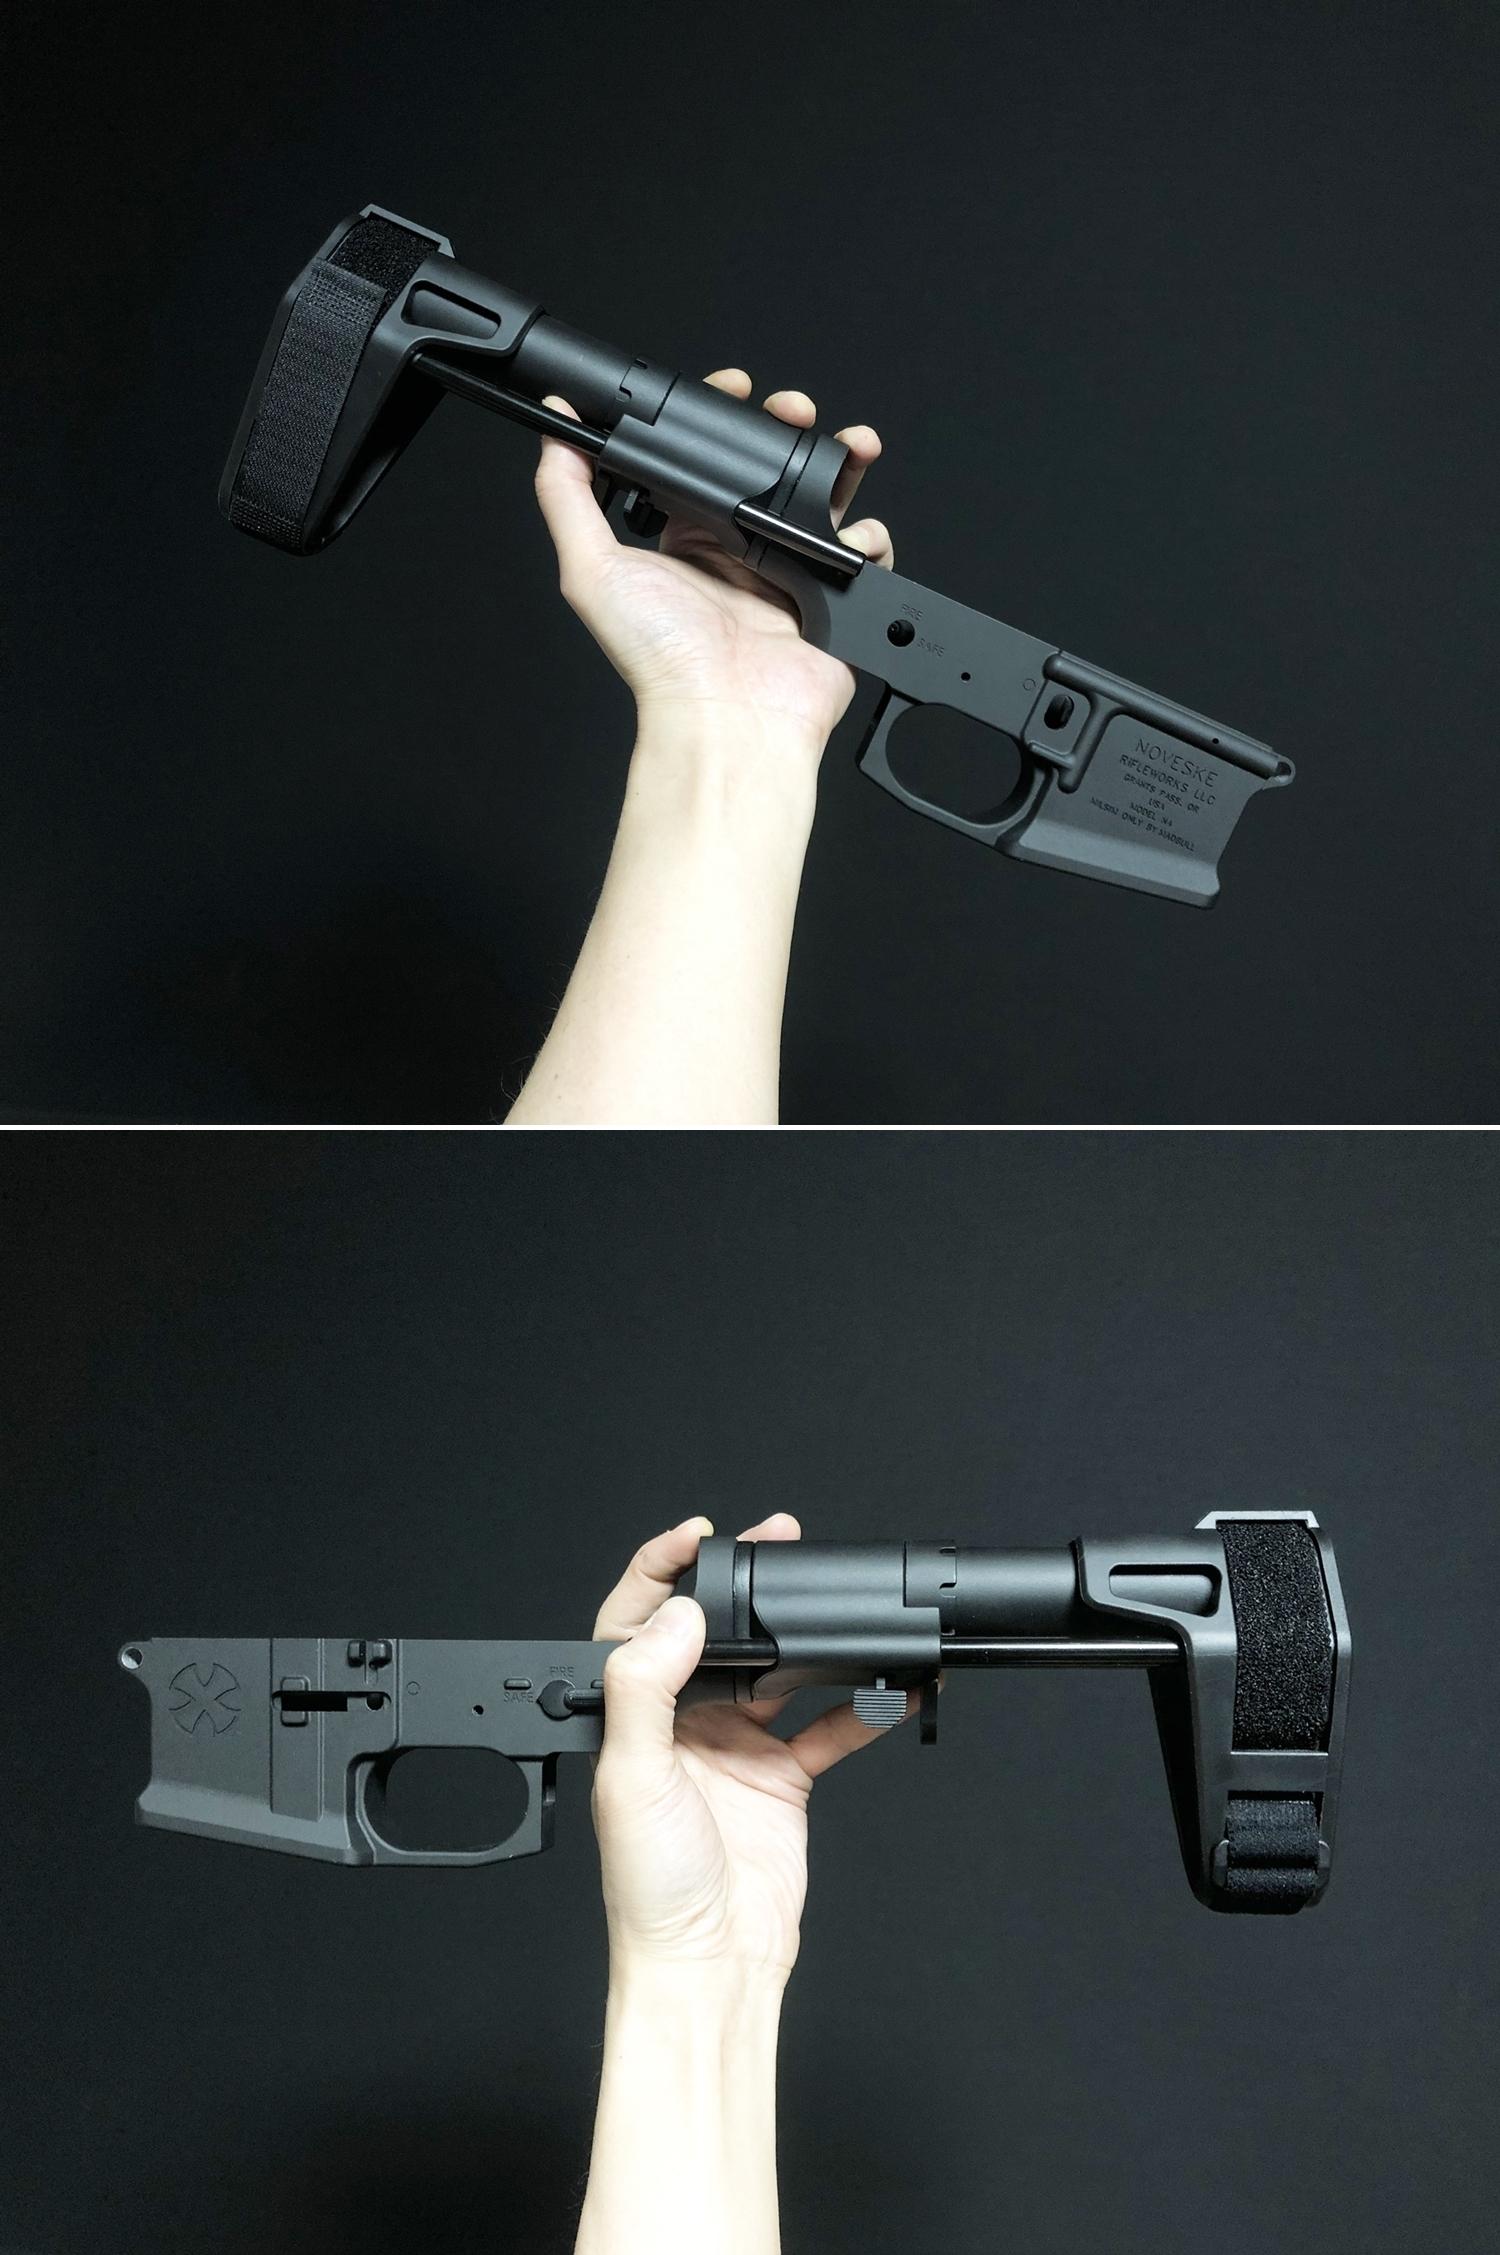 23 SB TACTICAL SB-PDW TYPE!! ちょっと気になって 購入~検証~DIY してみた!! STD電動ガン専用 M4 AR-15 スタビブレース バットストック & NOVESKE GEN3 MB専用 ポン付け ストック スリング プレート作製!!